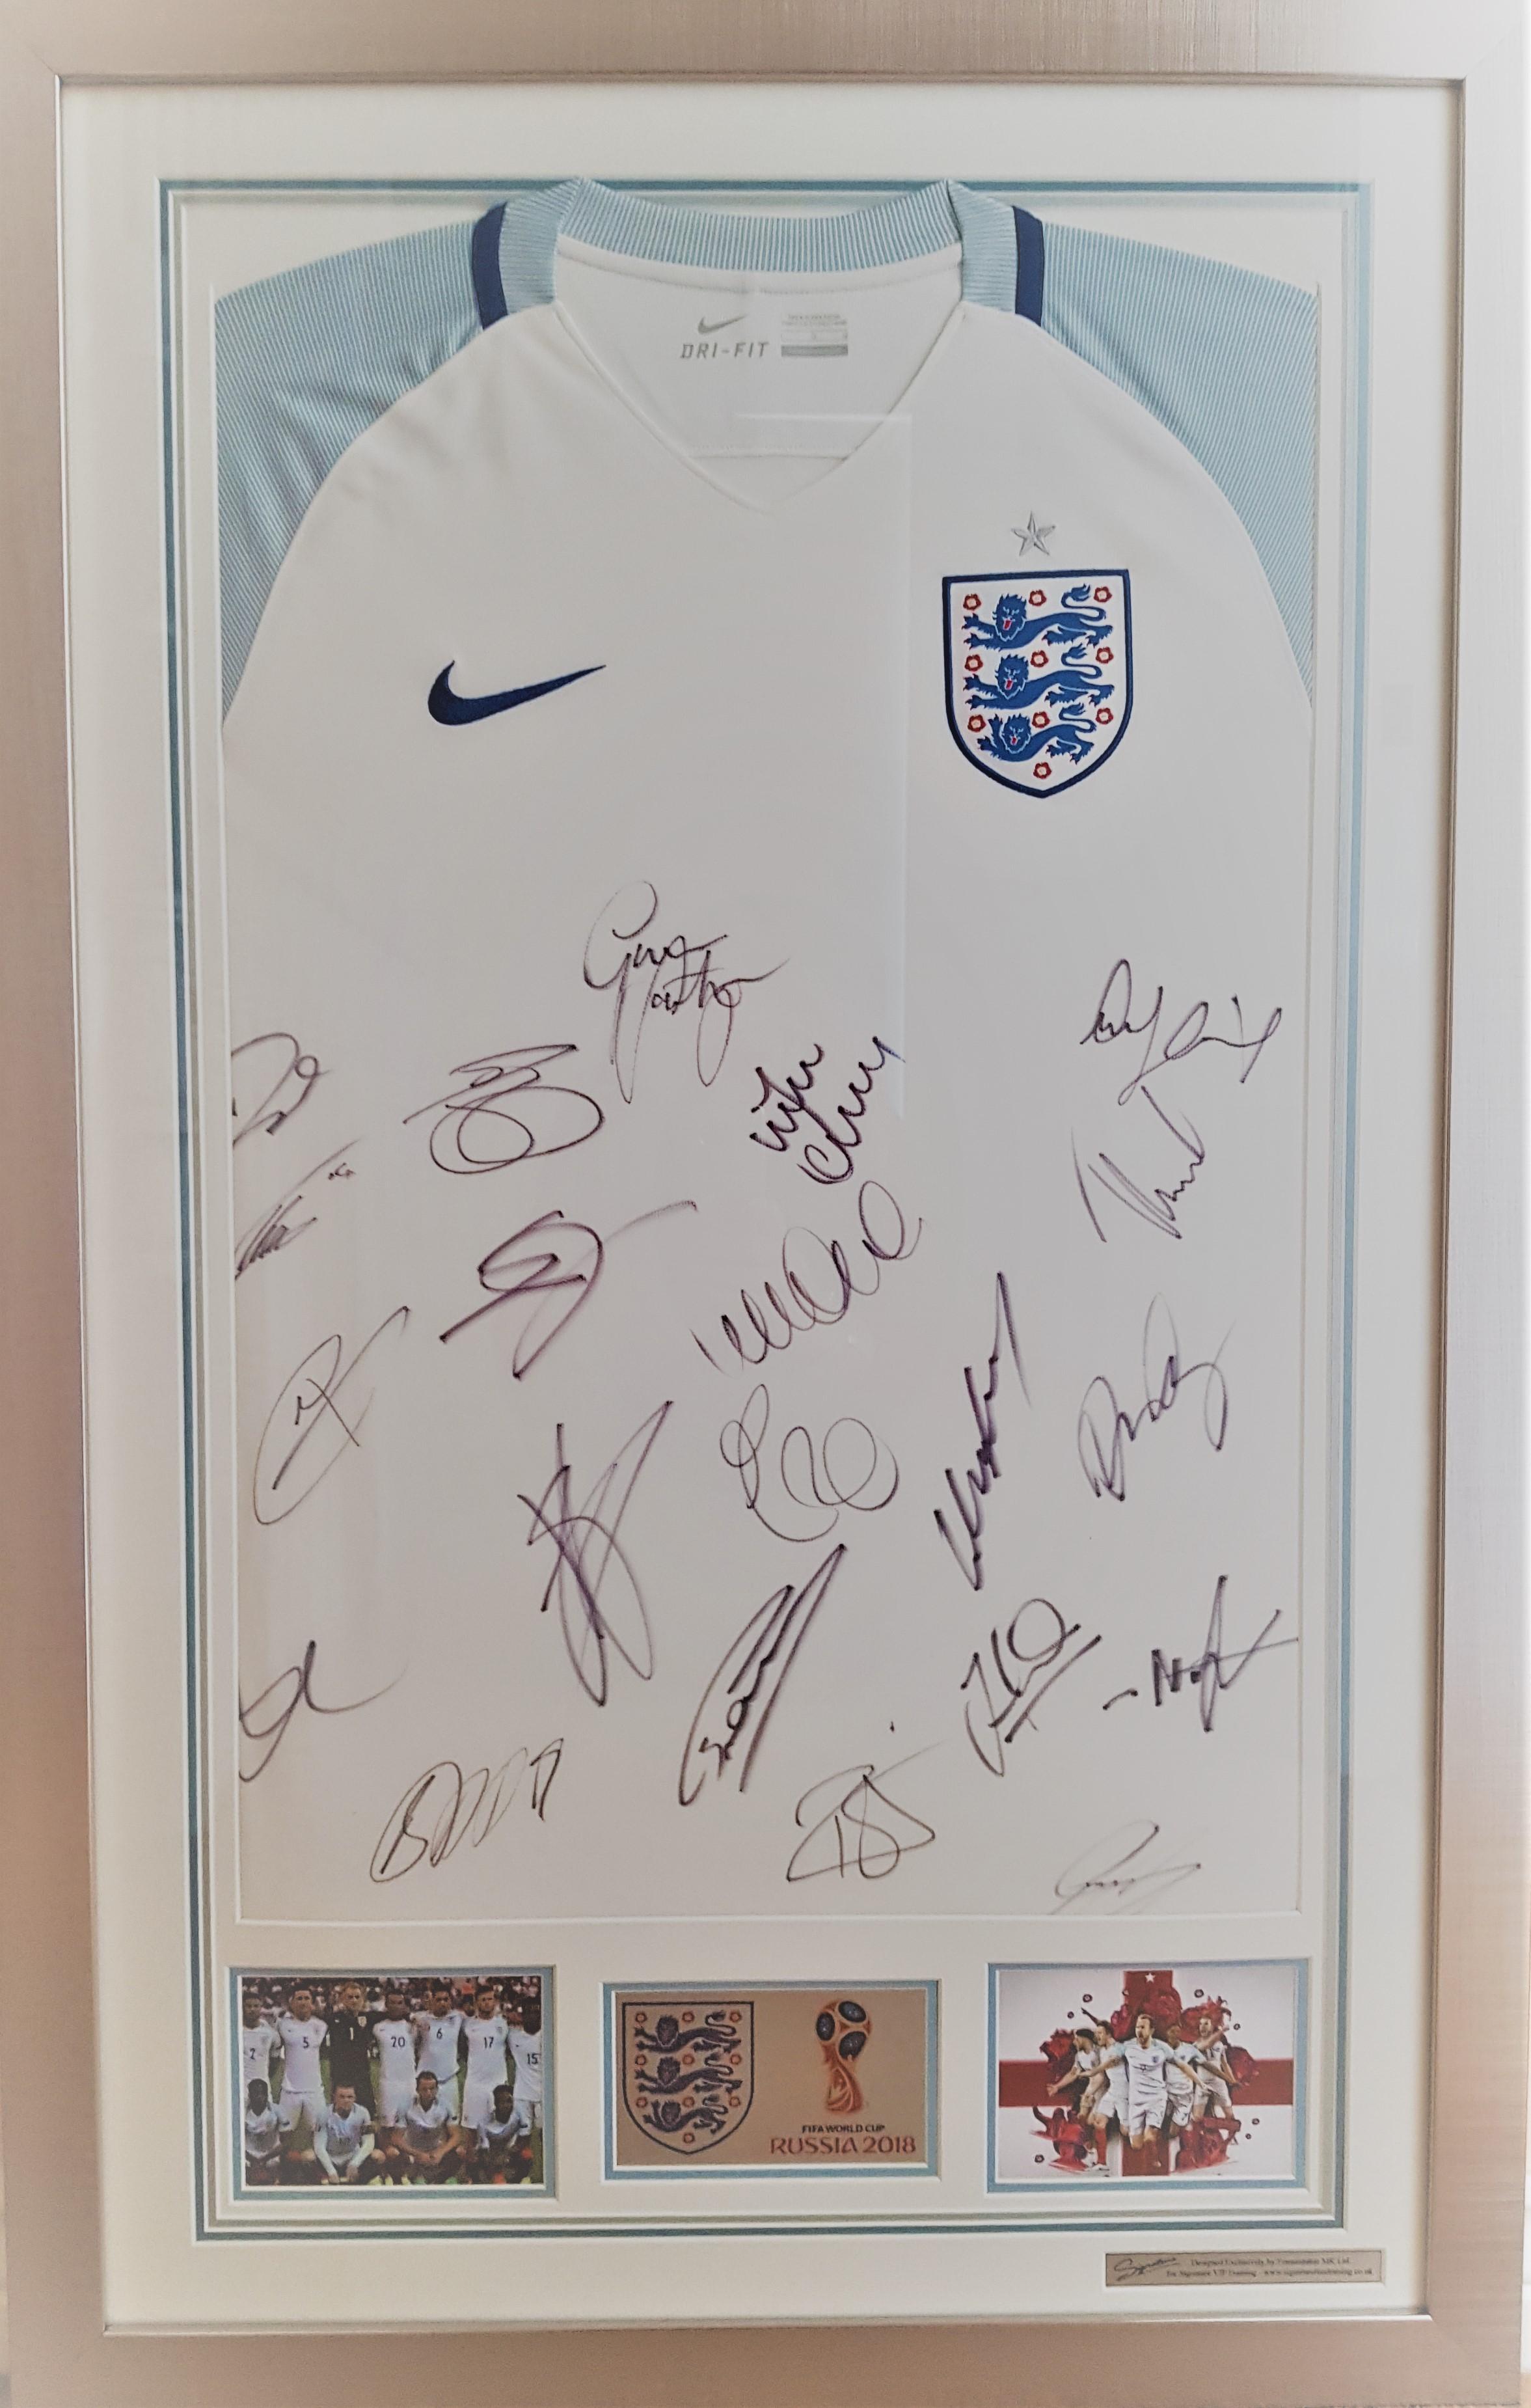 Win A Signed Framed England Shirt! post thumbnail image